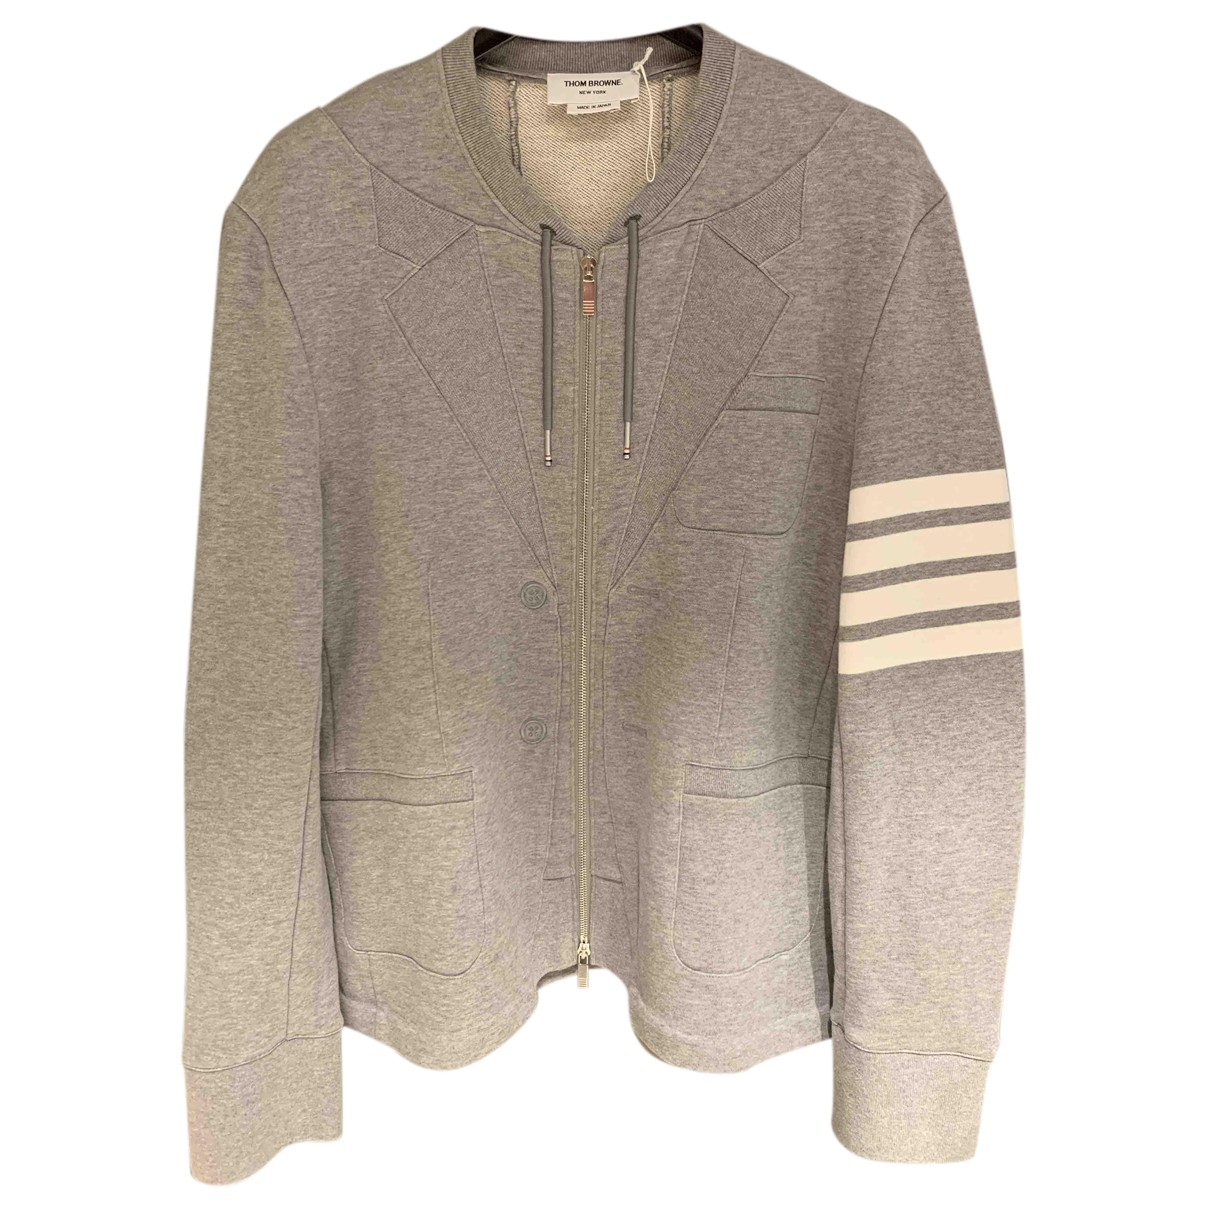 Thom Browne N Grey Cotton Knitwear & Sweatshirts for Men M International